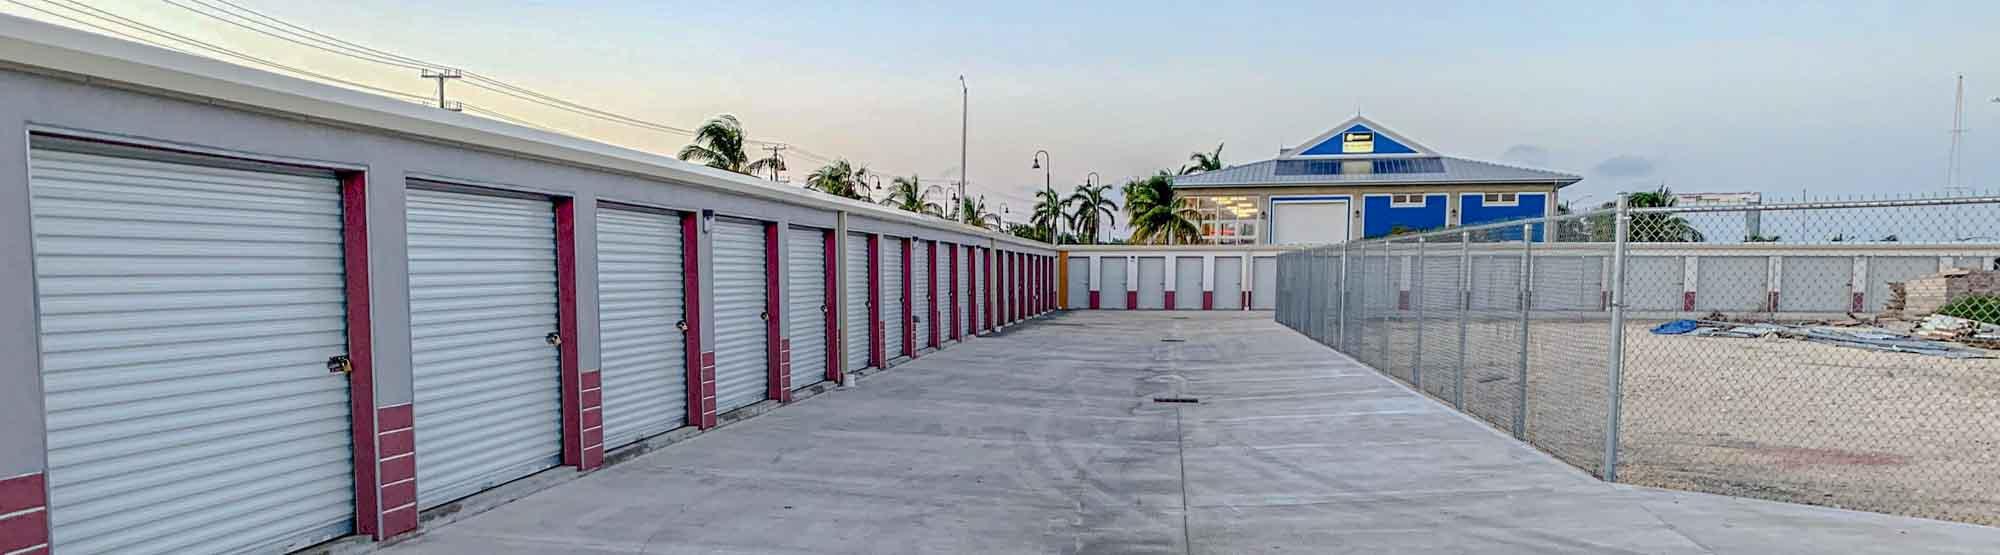 Cayman Storage. The Island's most state-of-the-art Cayman Island Storage units